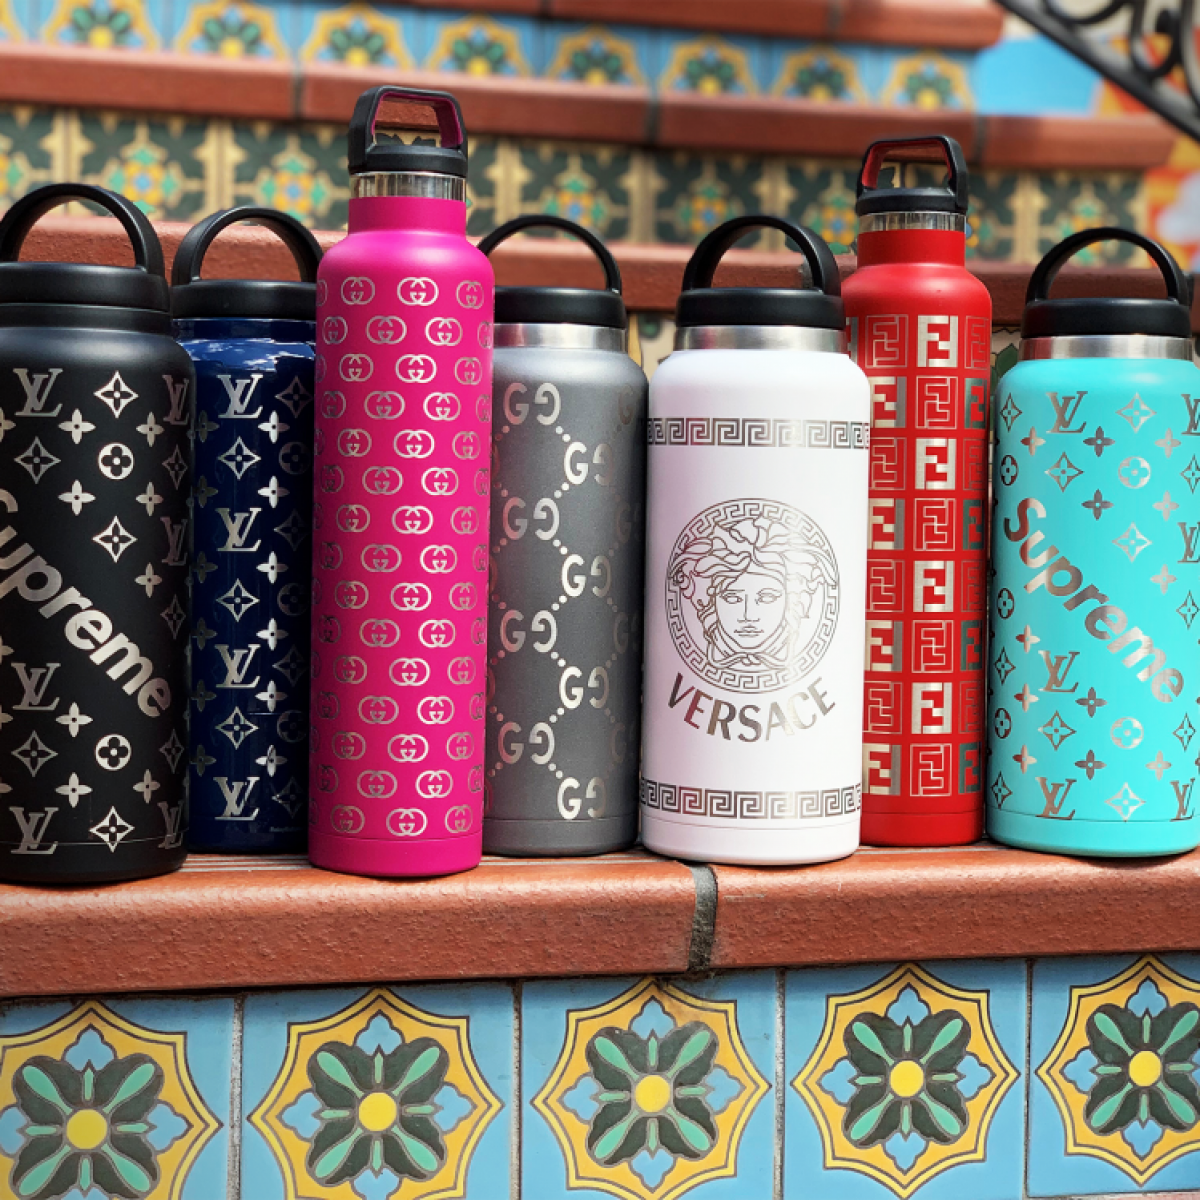 Supreme Water Bottles (RelayBatons.com)